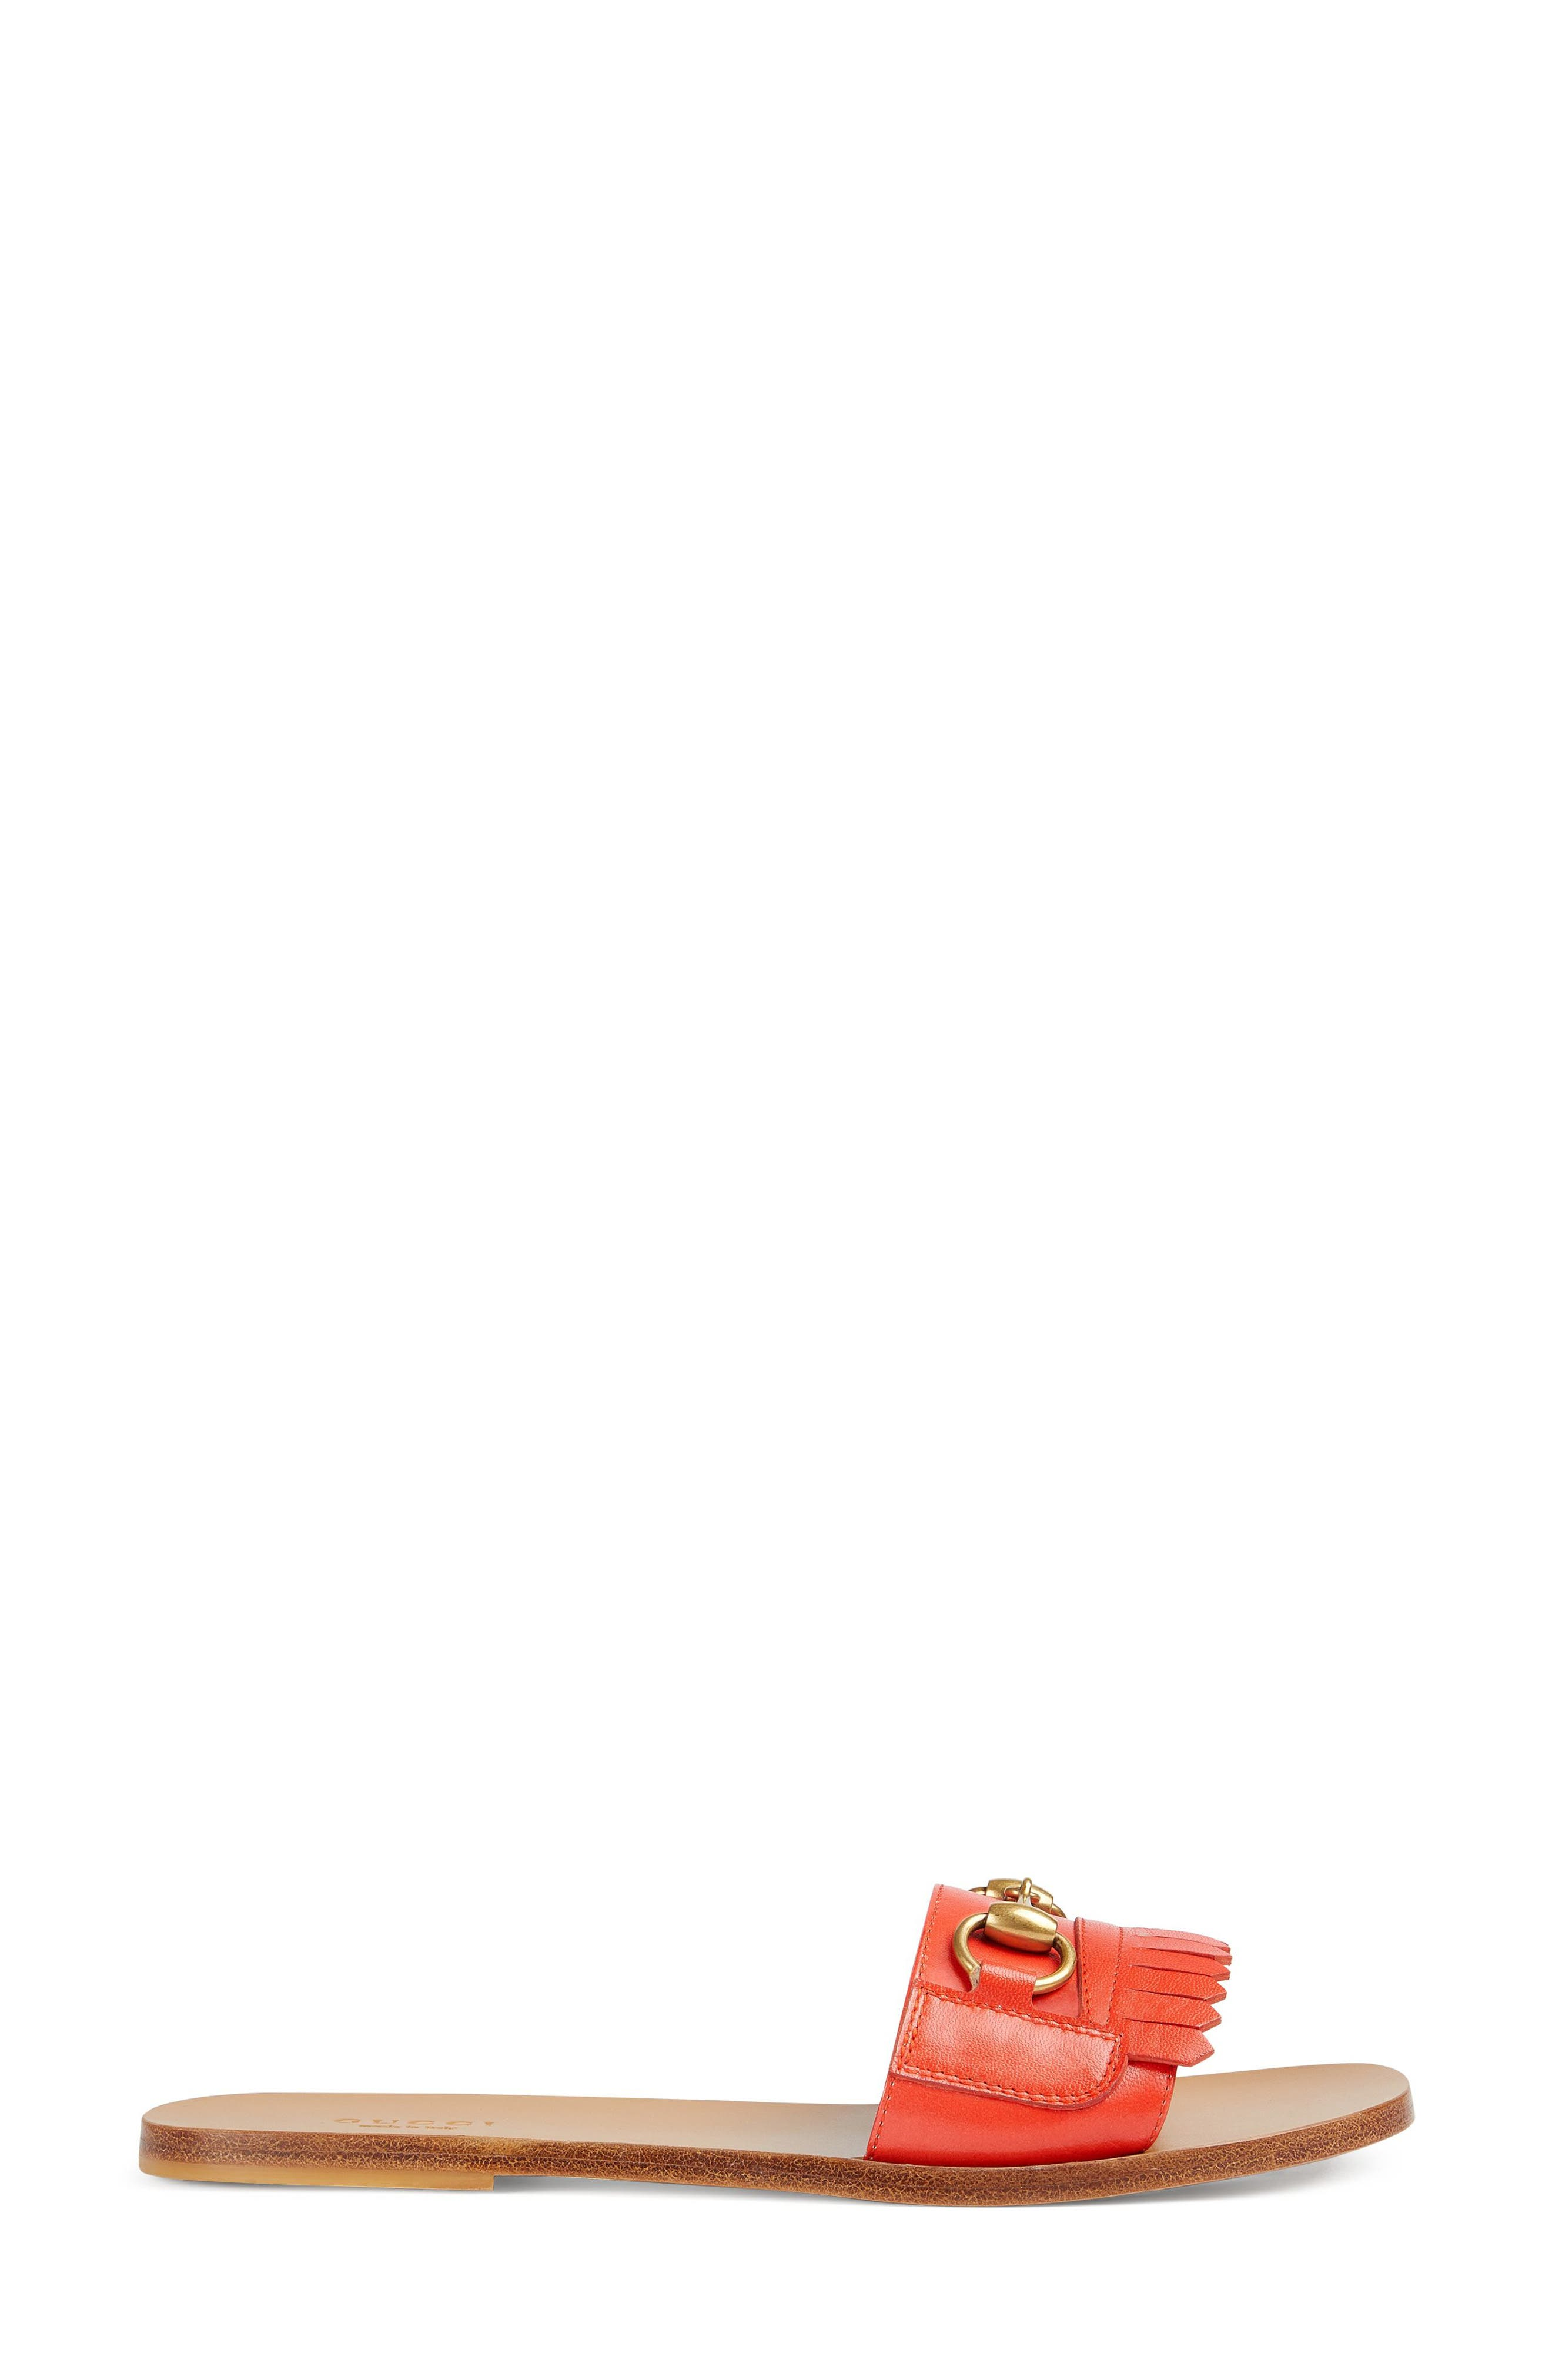 Varadero Slide Sandal,                             Alternate thumbnail 2, color,                             Orange